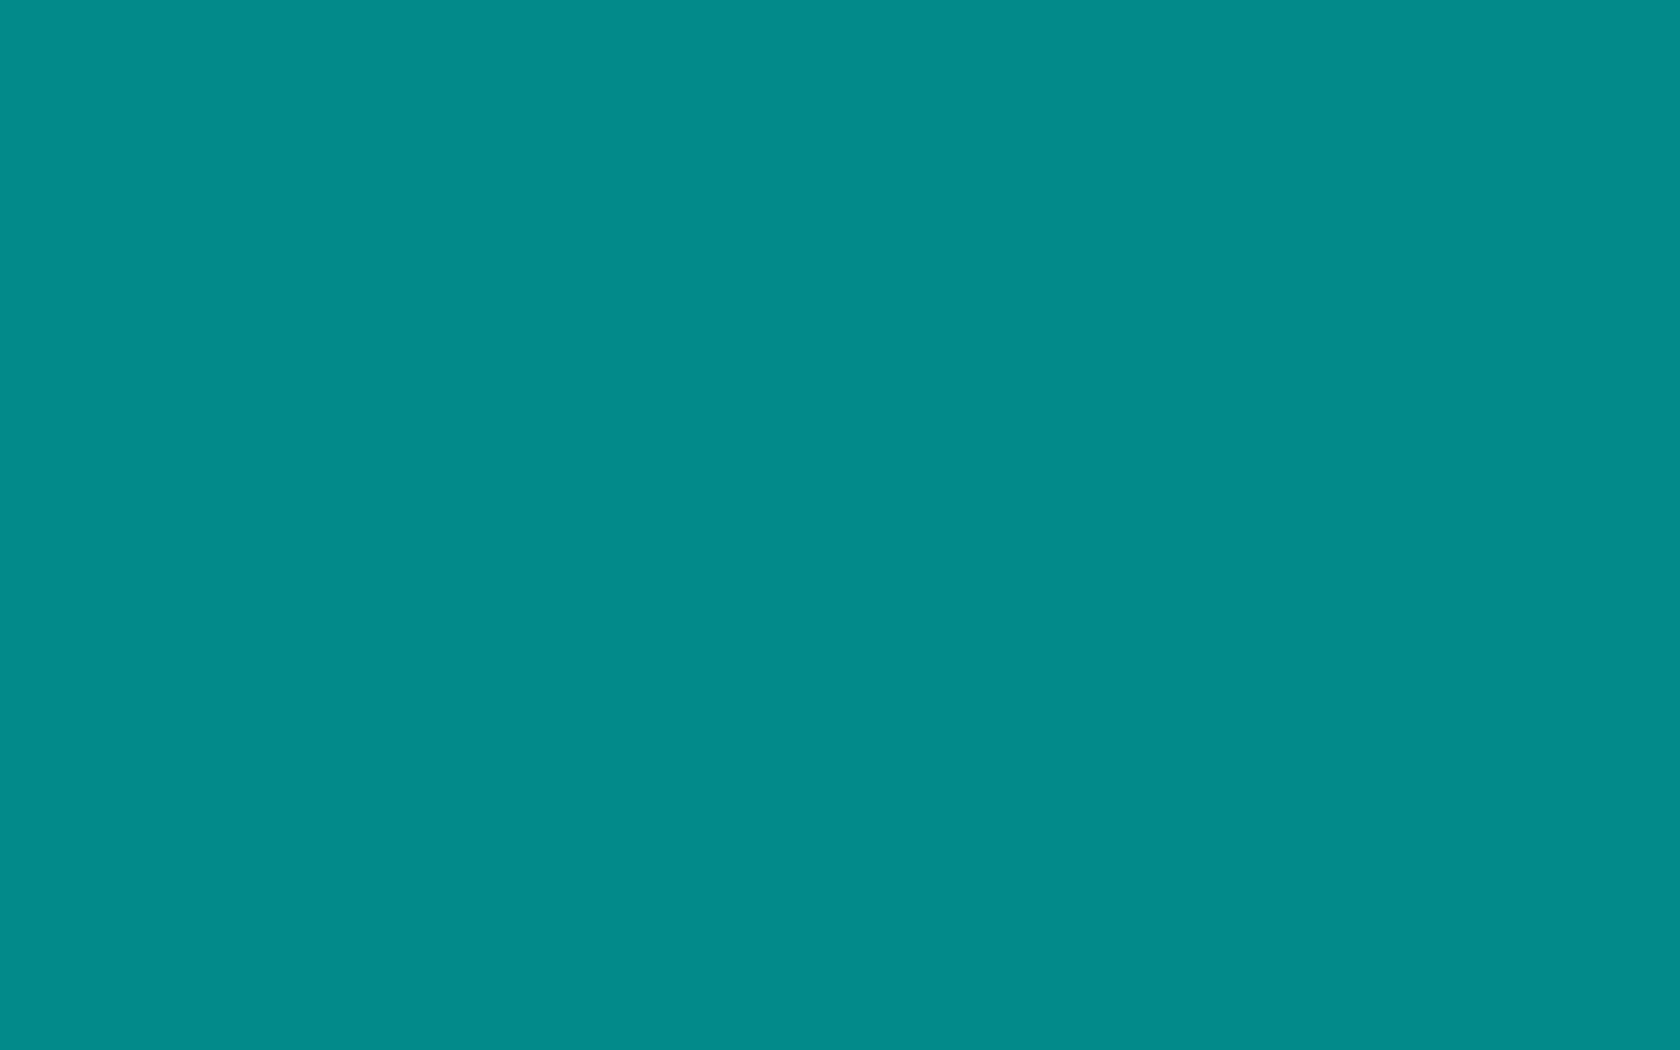 1680x1050 Dark Cyan Solid Color Background